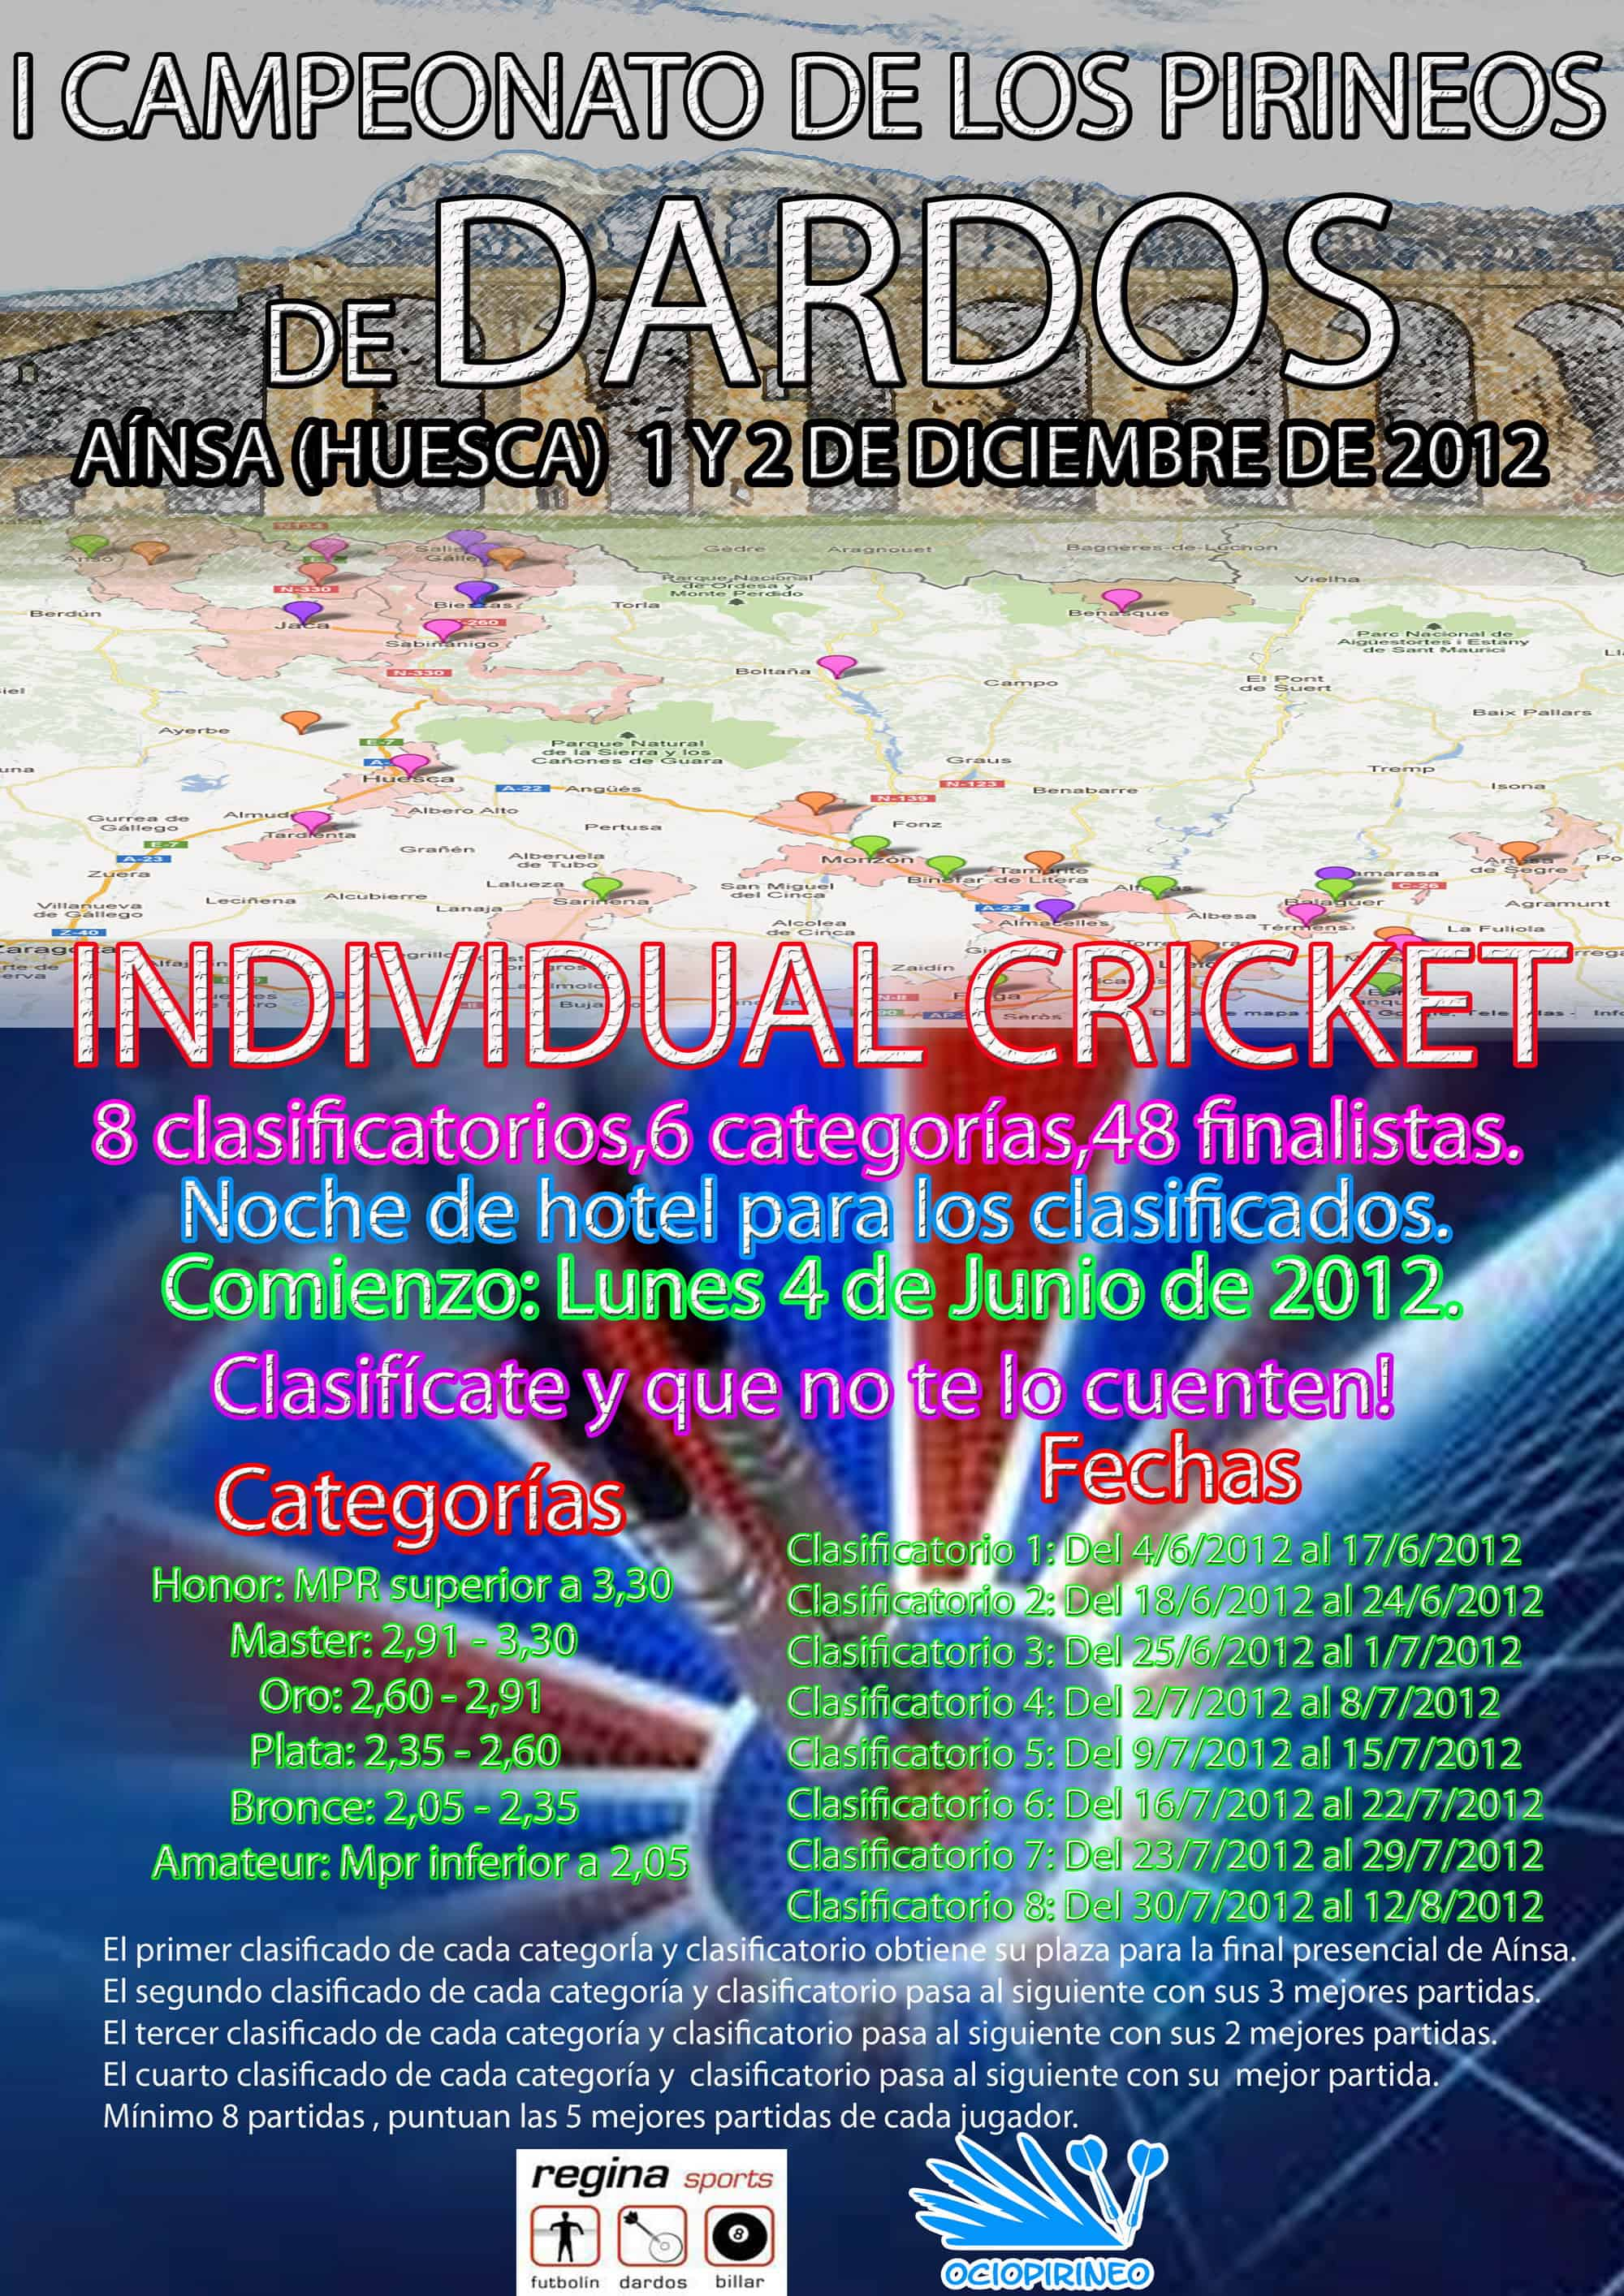 individial_cricket_pirineos1.jpg